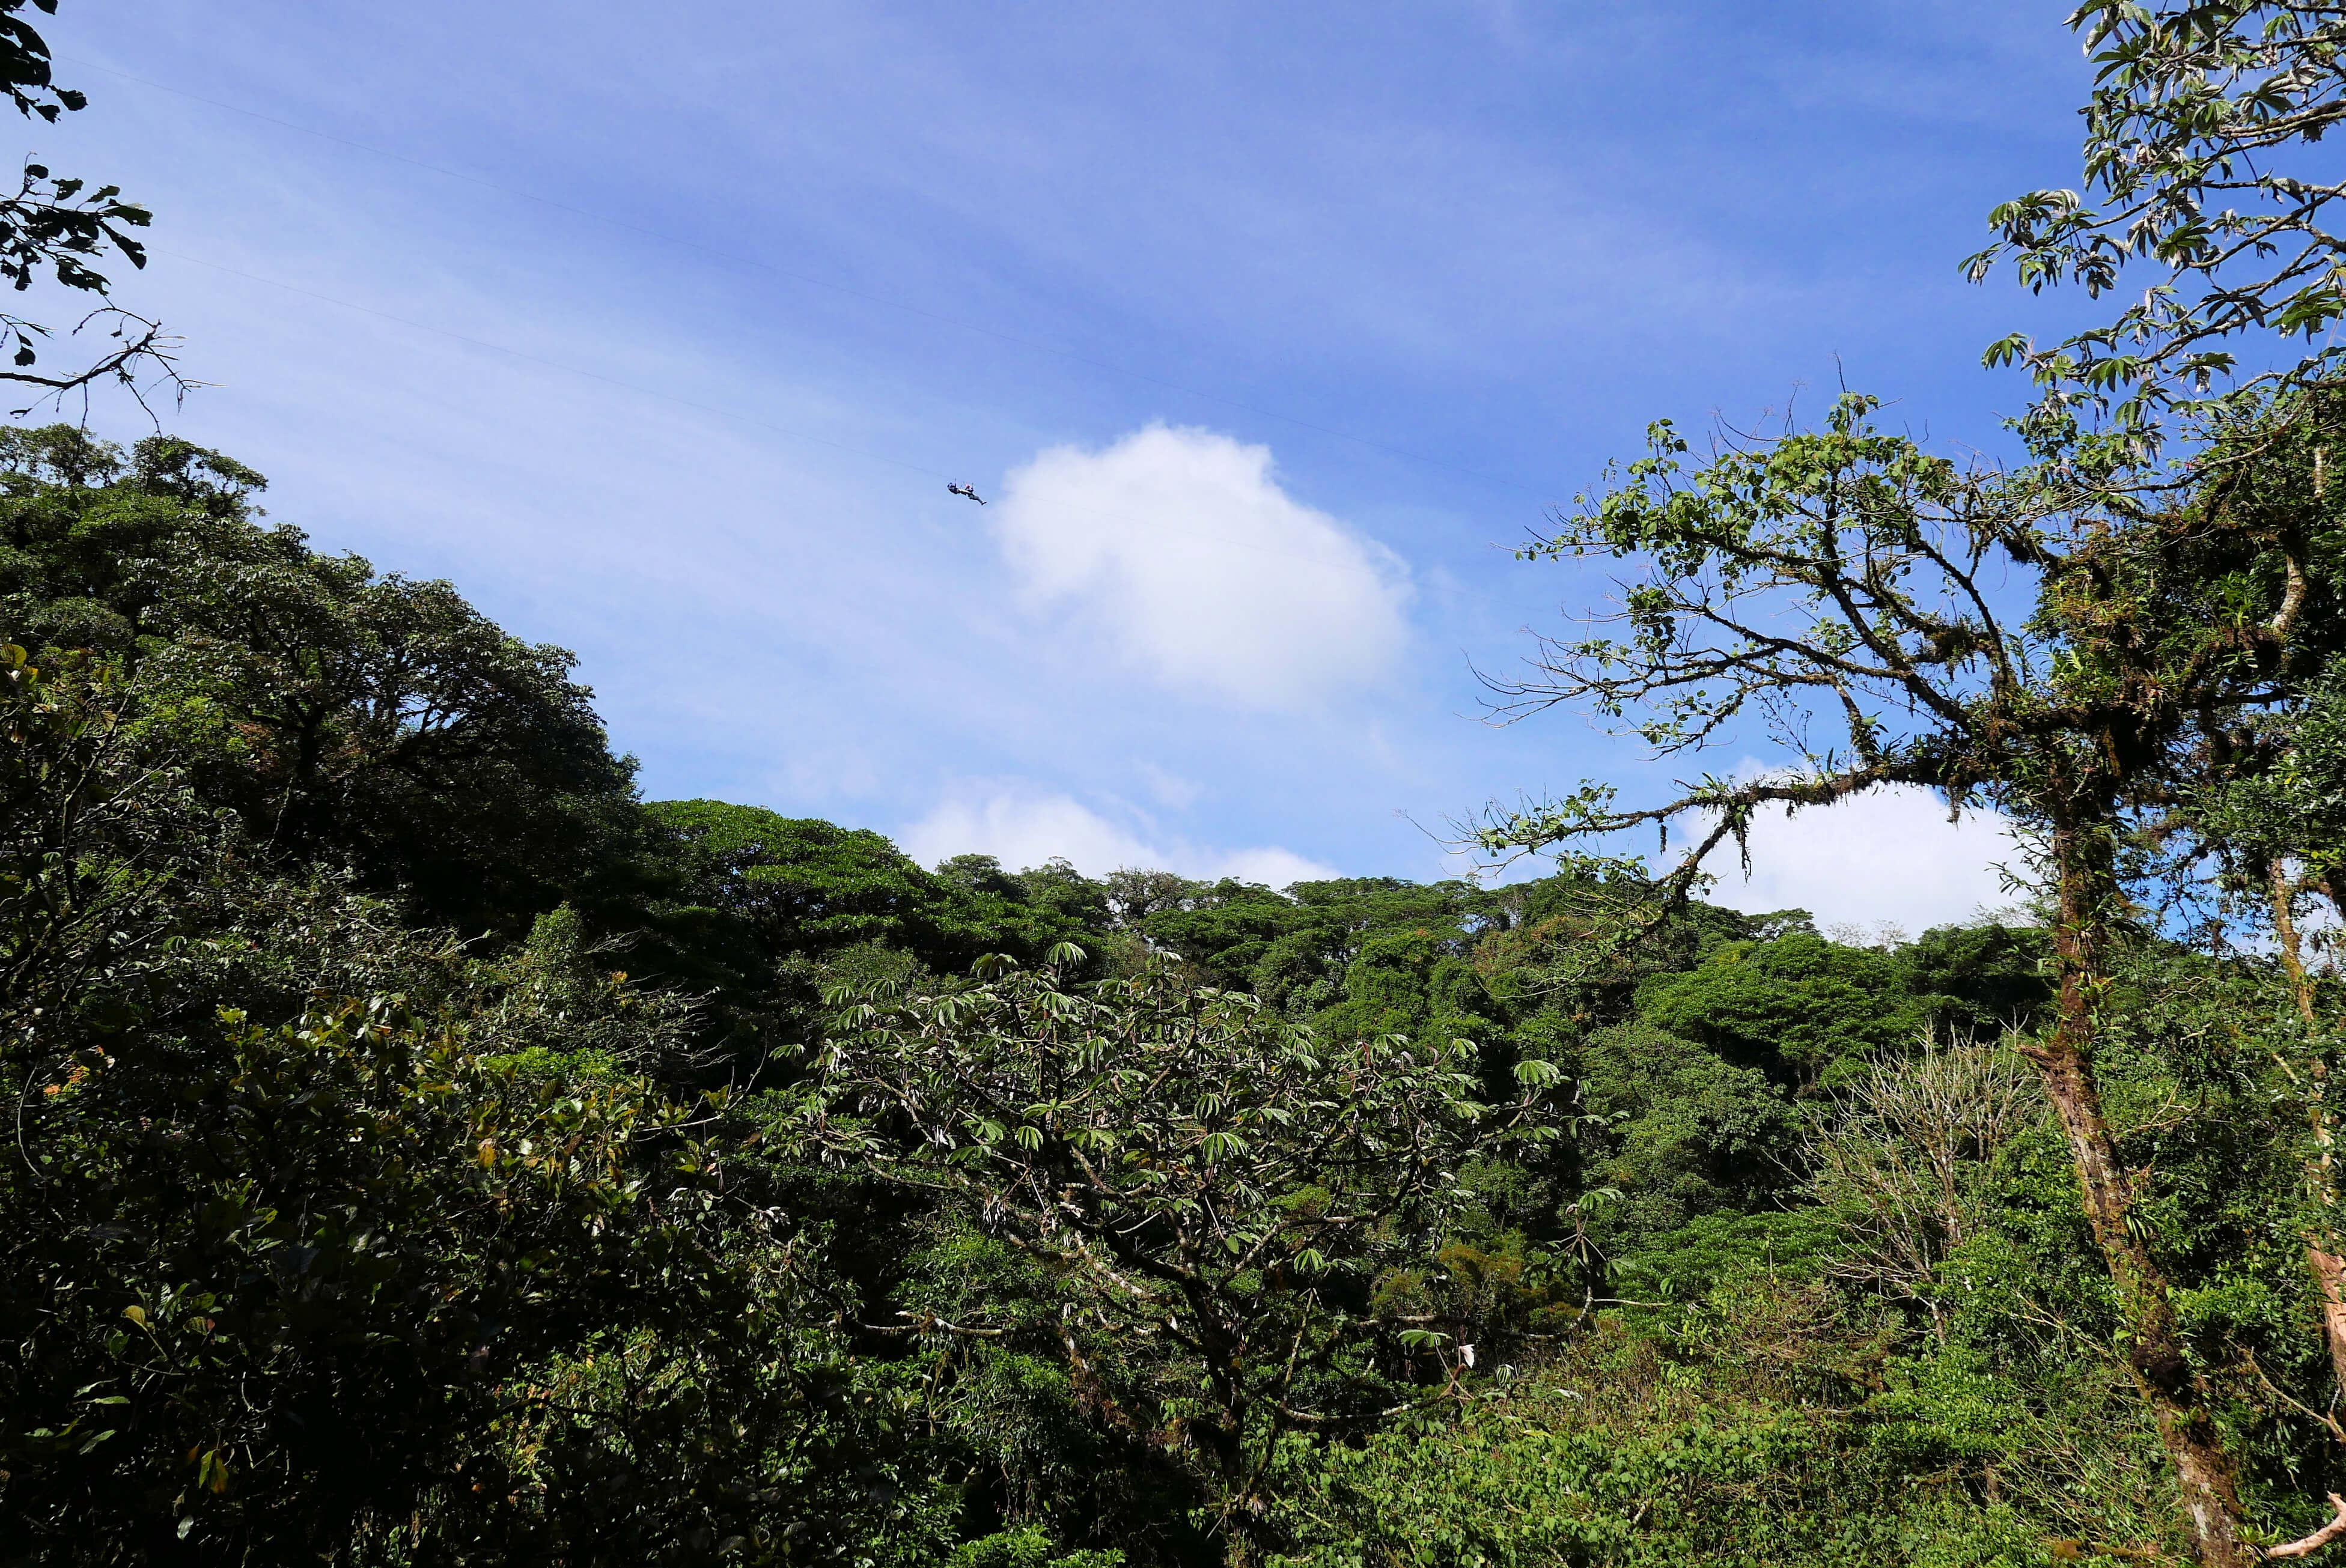 Zip Lining in Selvature Adventure Park in Costa Rica